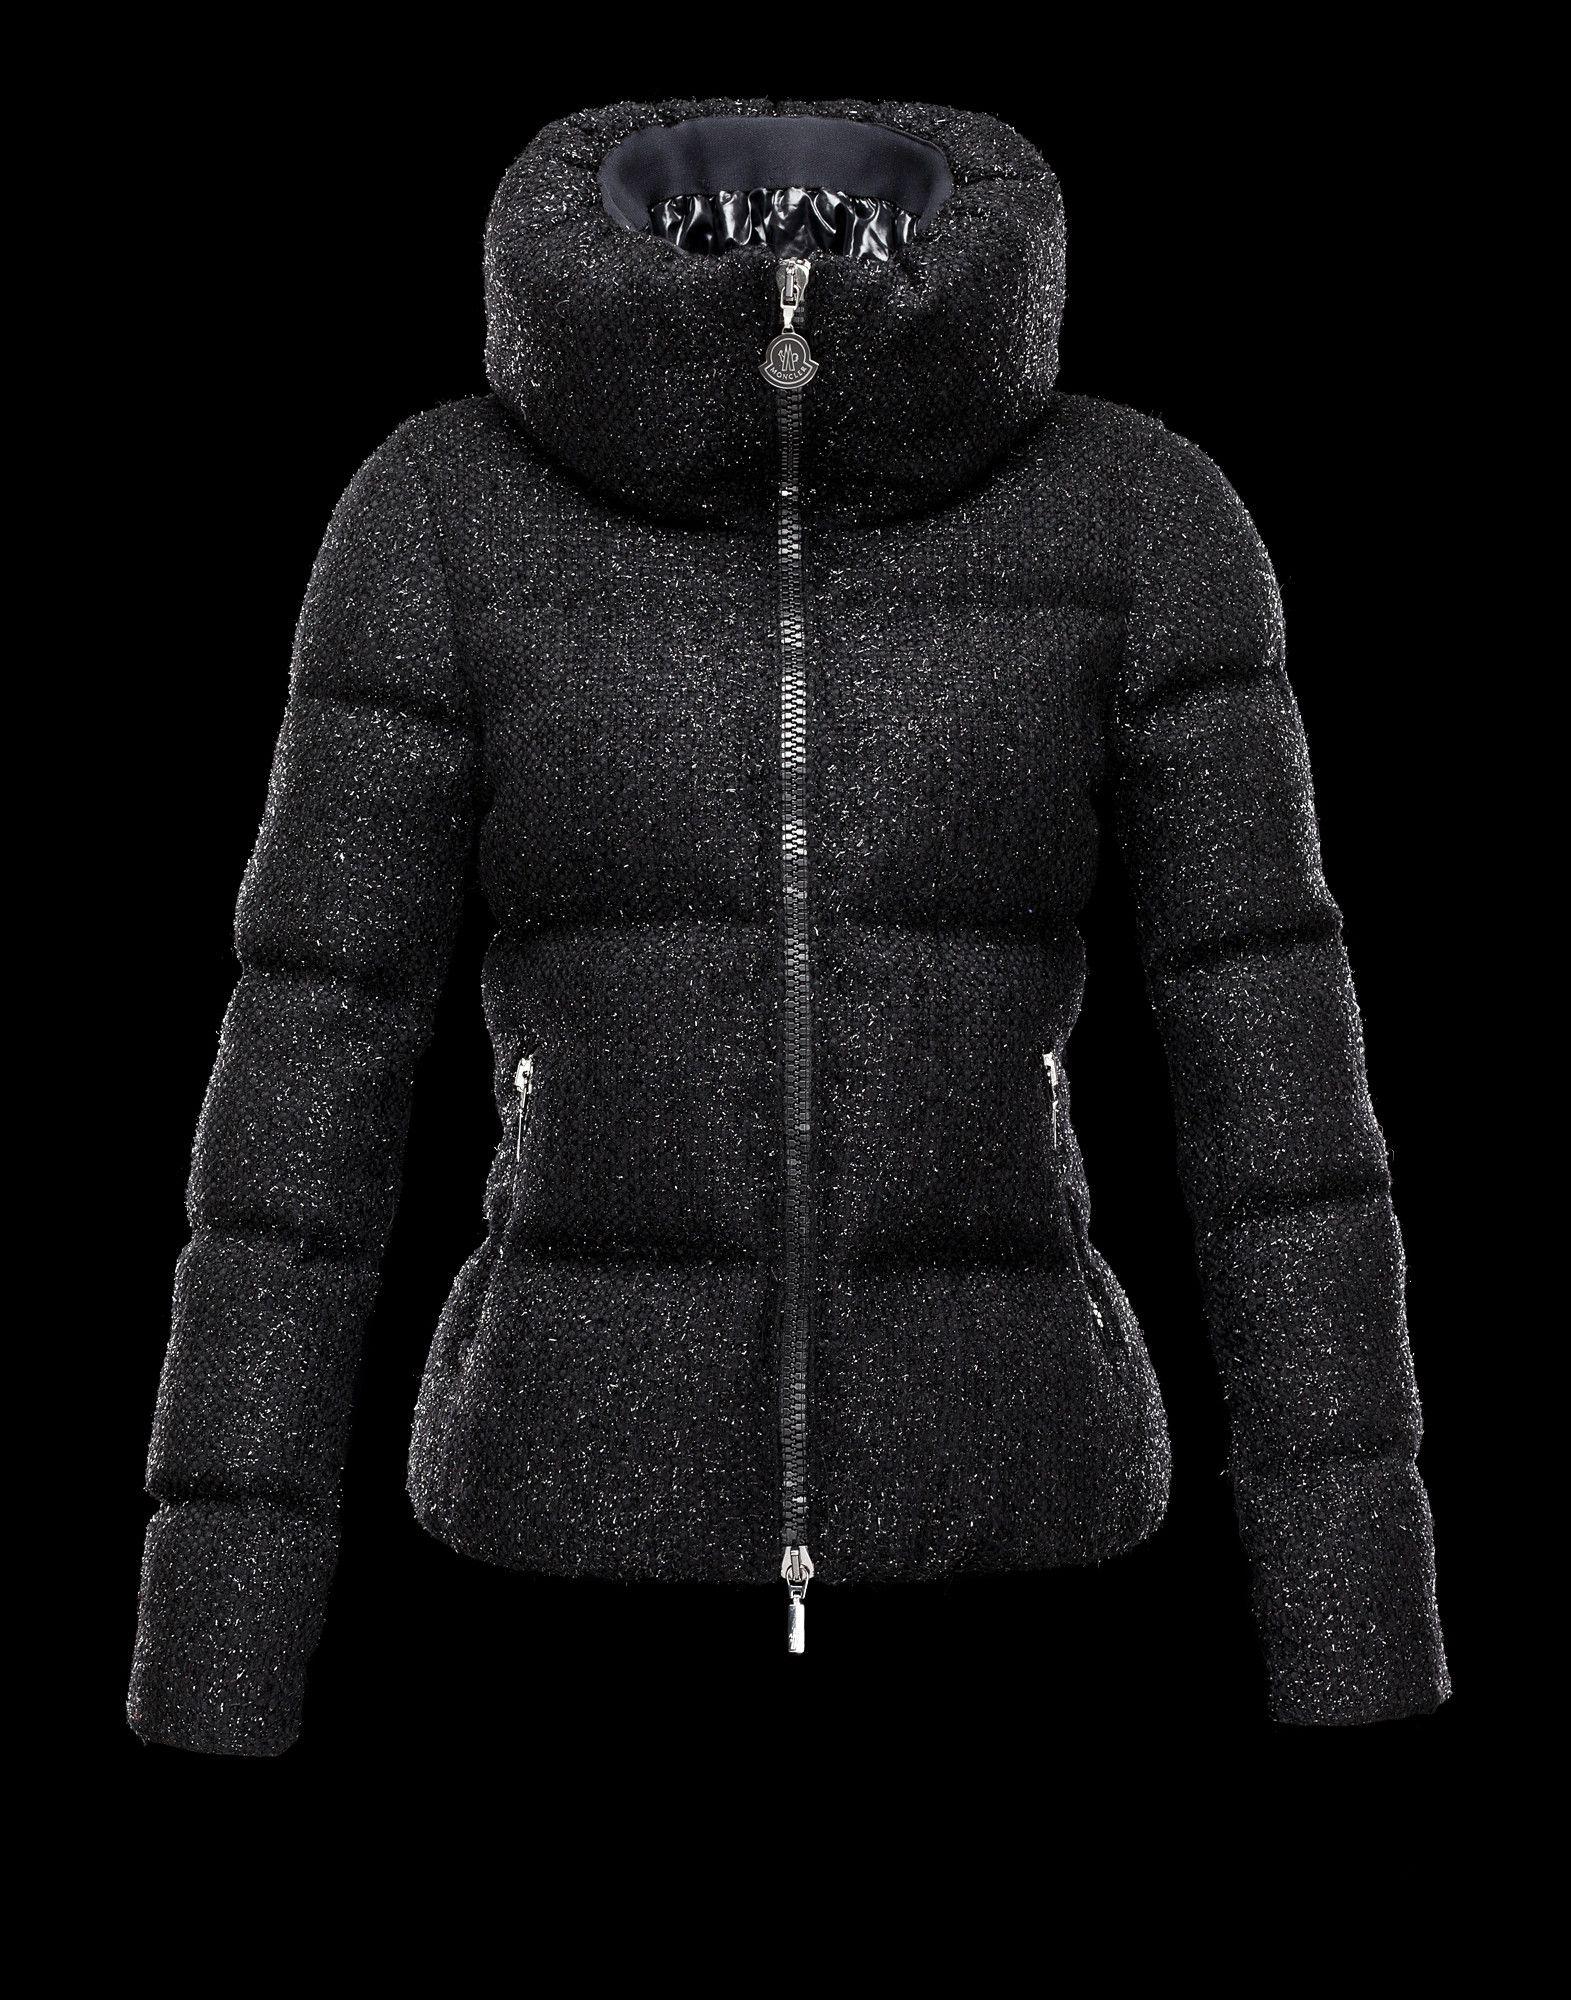 0f72ad3ba MONCLER Women - Fall/Winter 12-13 - OUTERWEAR - Jacket - RATEL | SKI ...